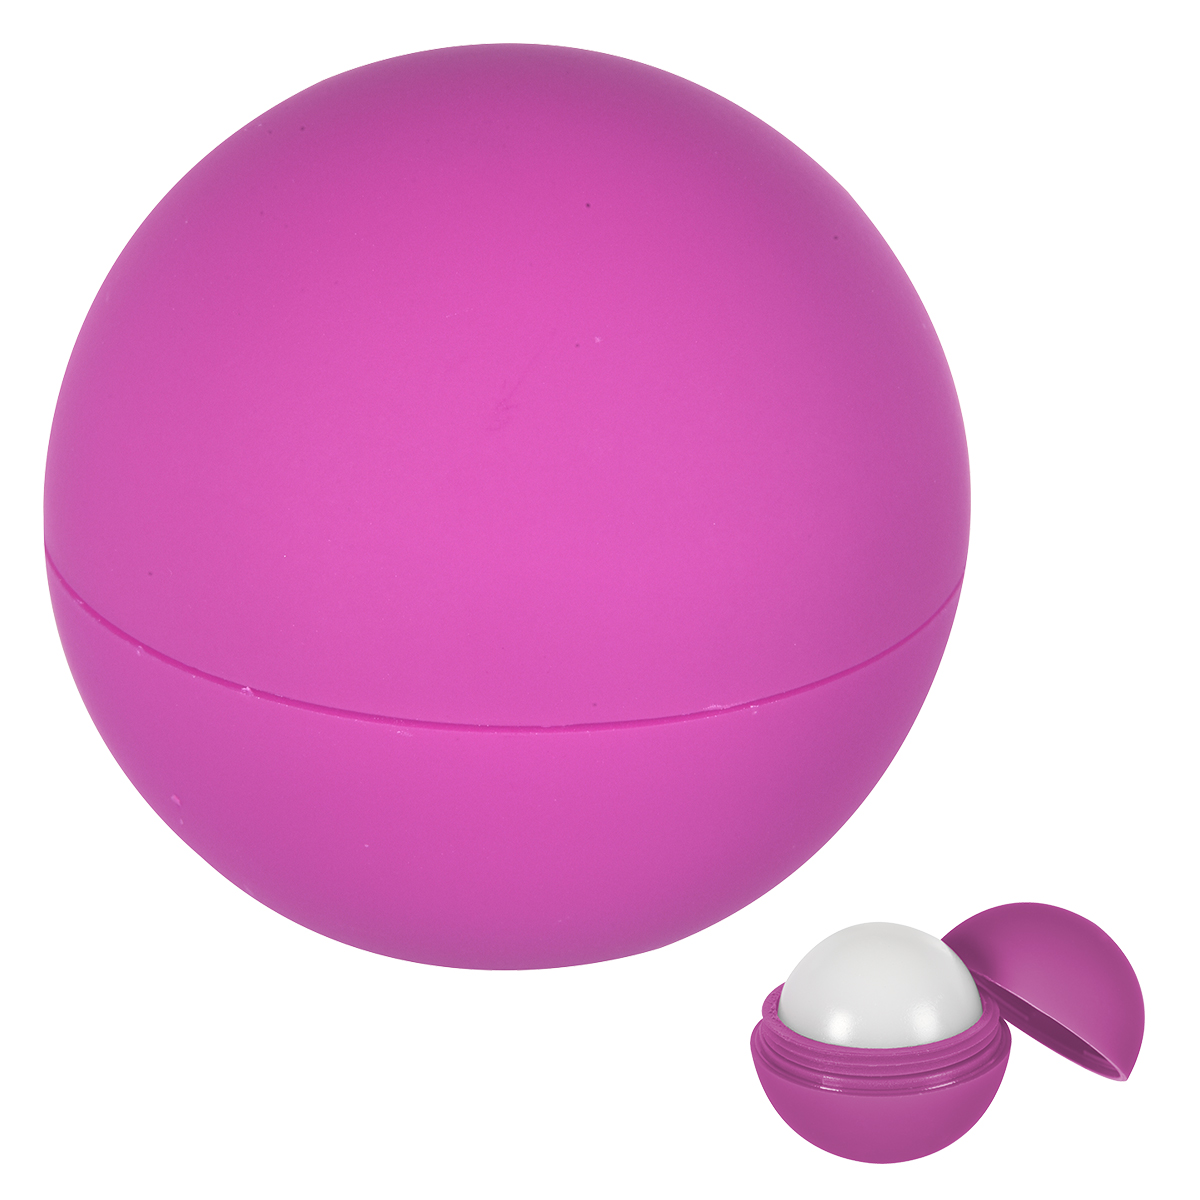 Rubberized Lip Moisture Ball